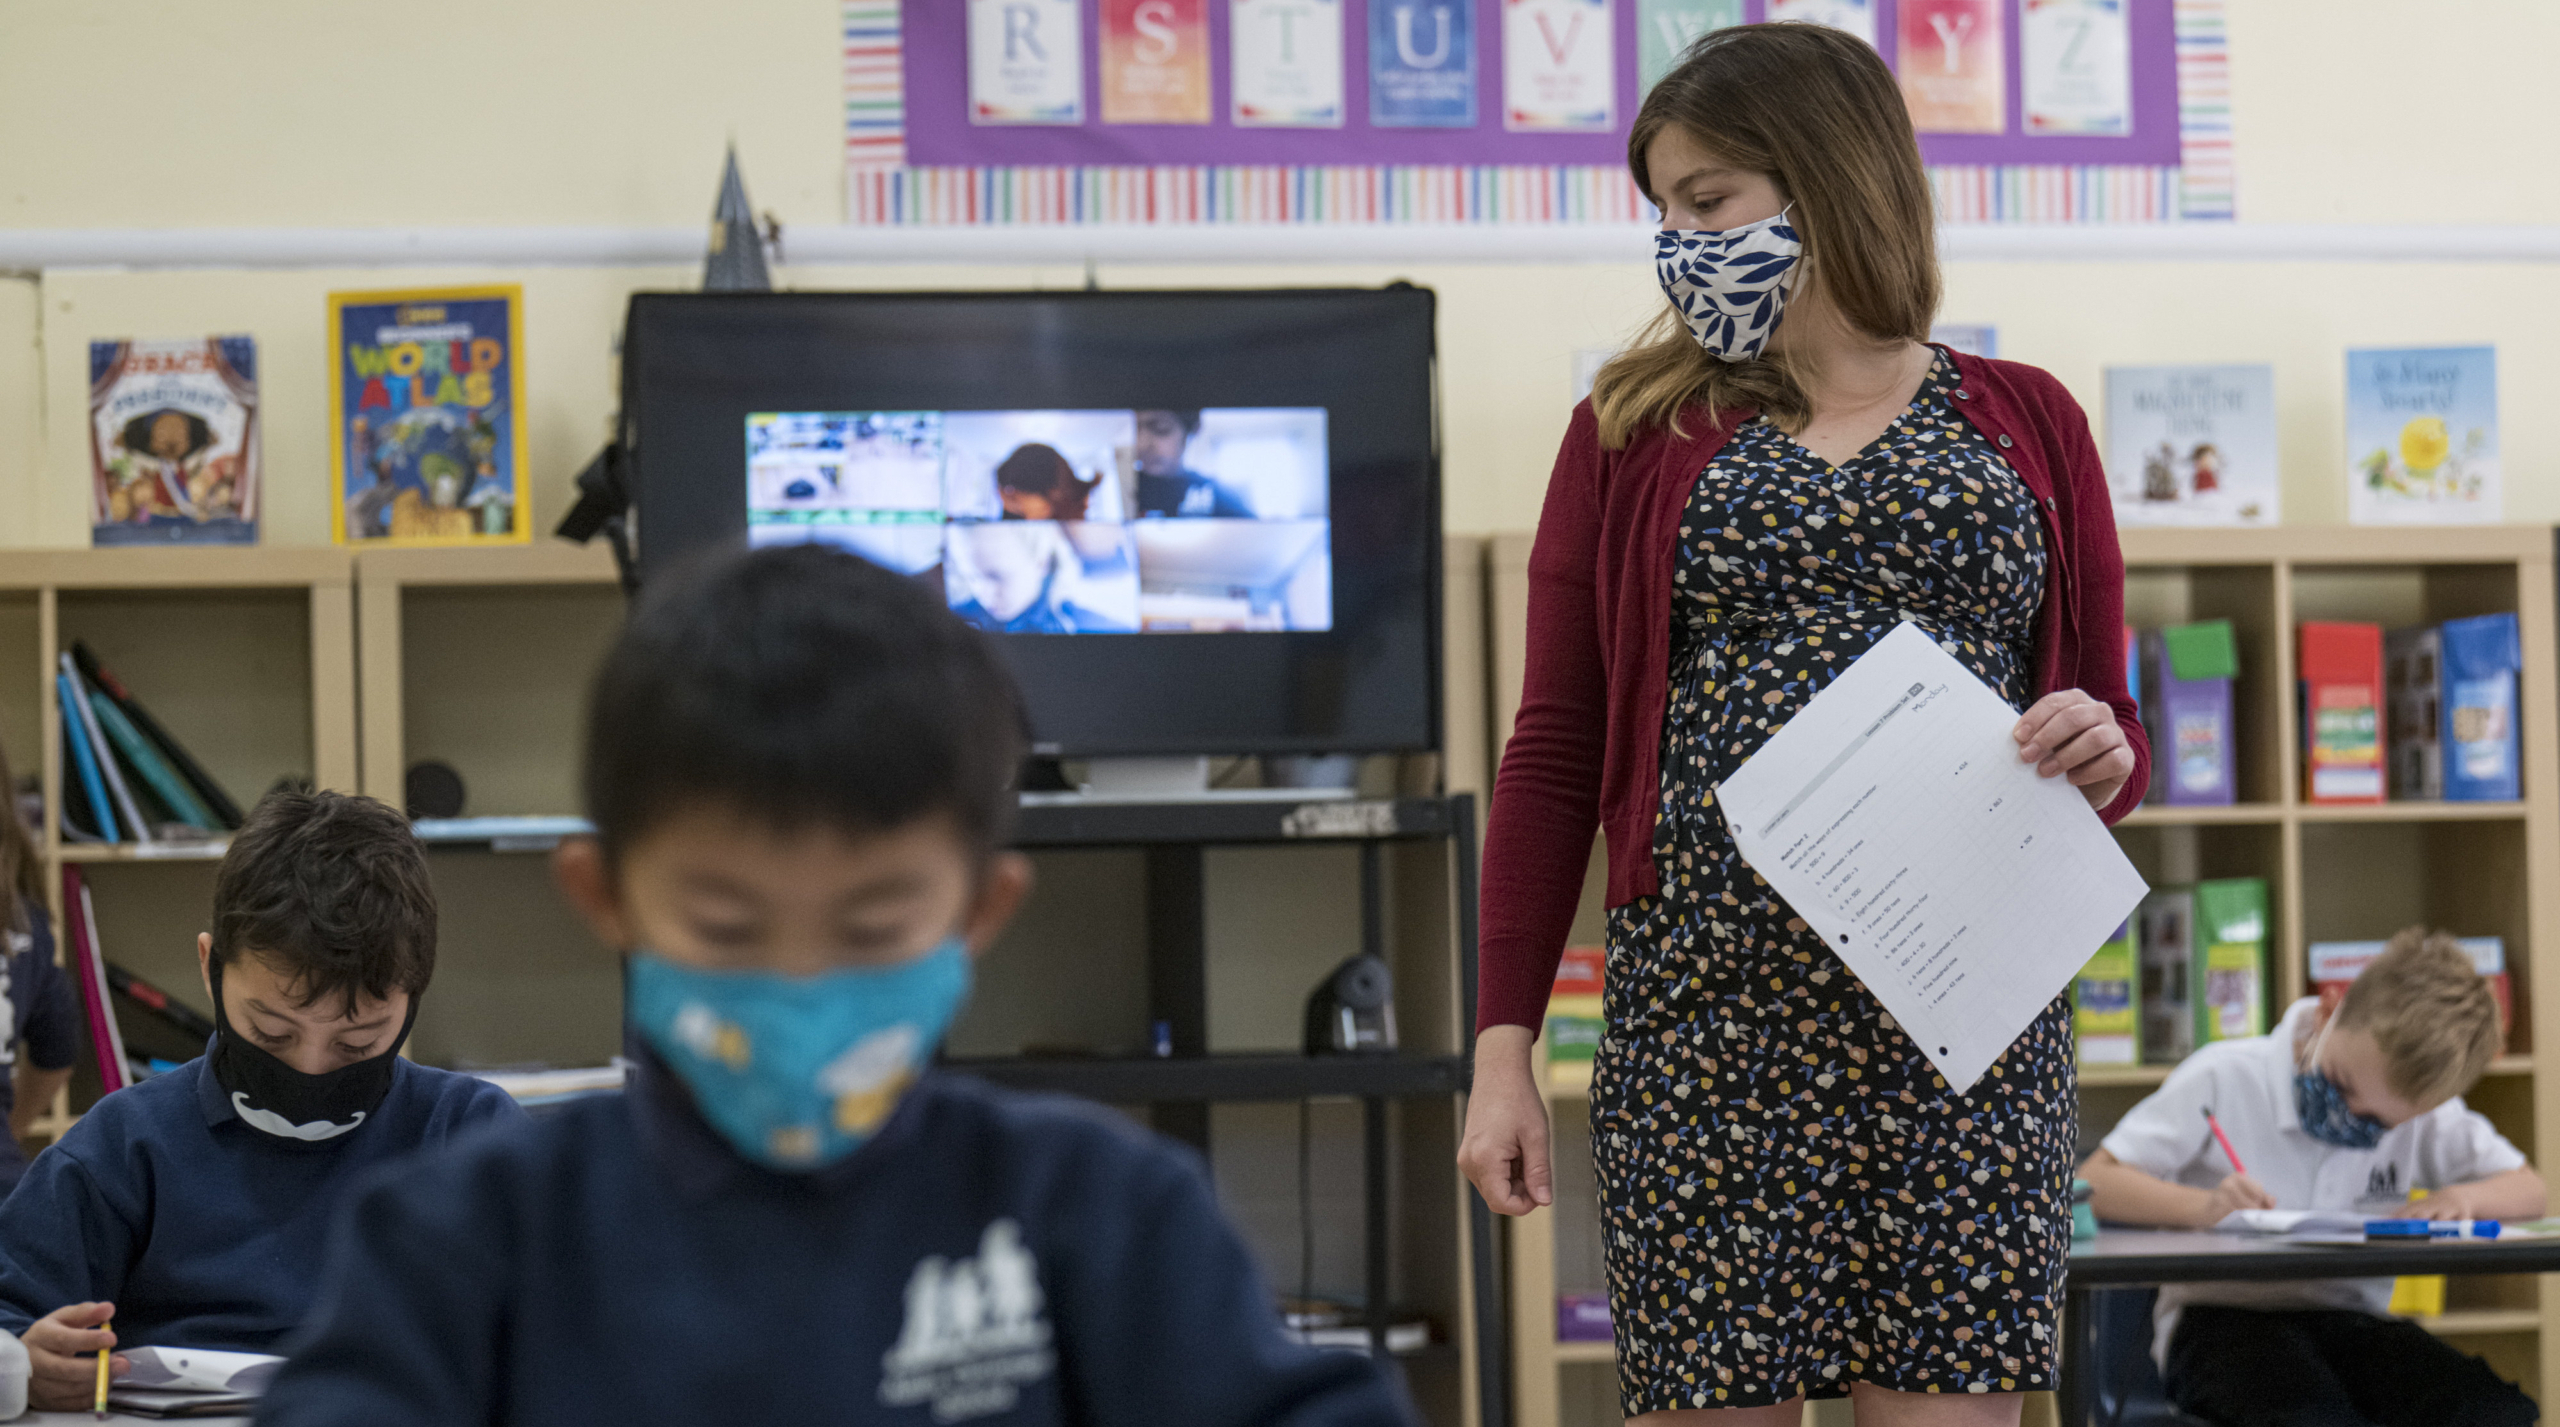 Ionizers use in classrooms harmful